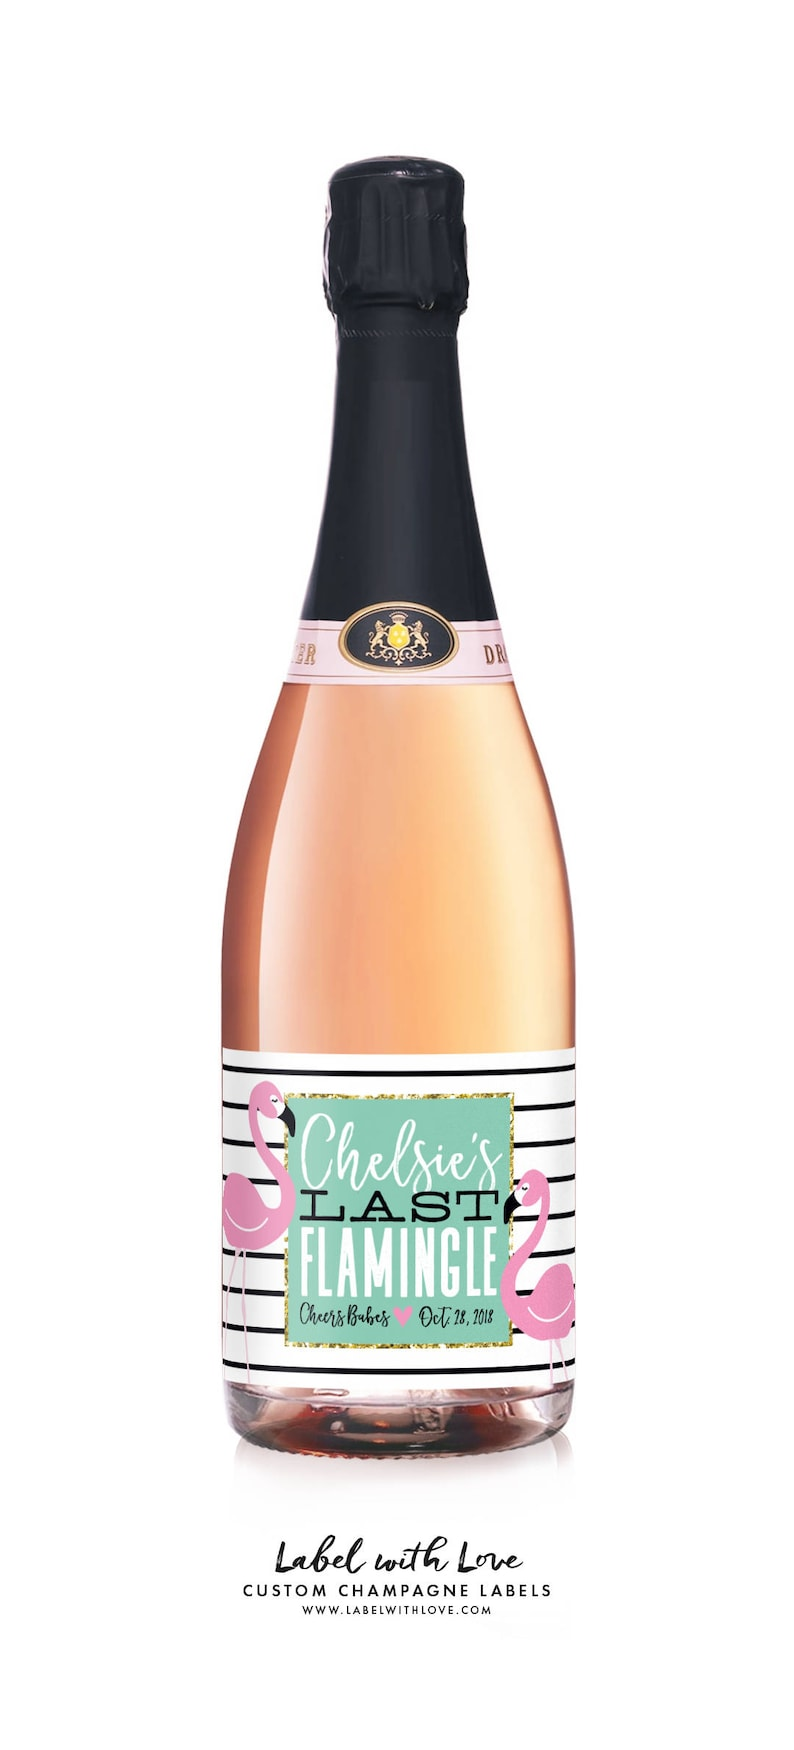 Beach Bridal Shower Pool Floatie Bachelorette Party Wine Labels Flamingo Party Last Flamingle Tropical Palm Springs Weekend Labels